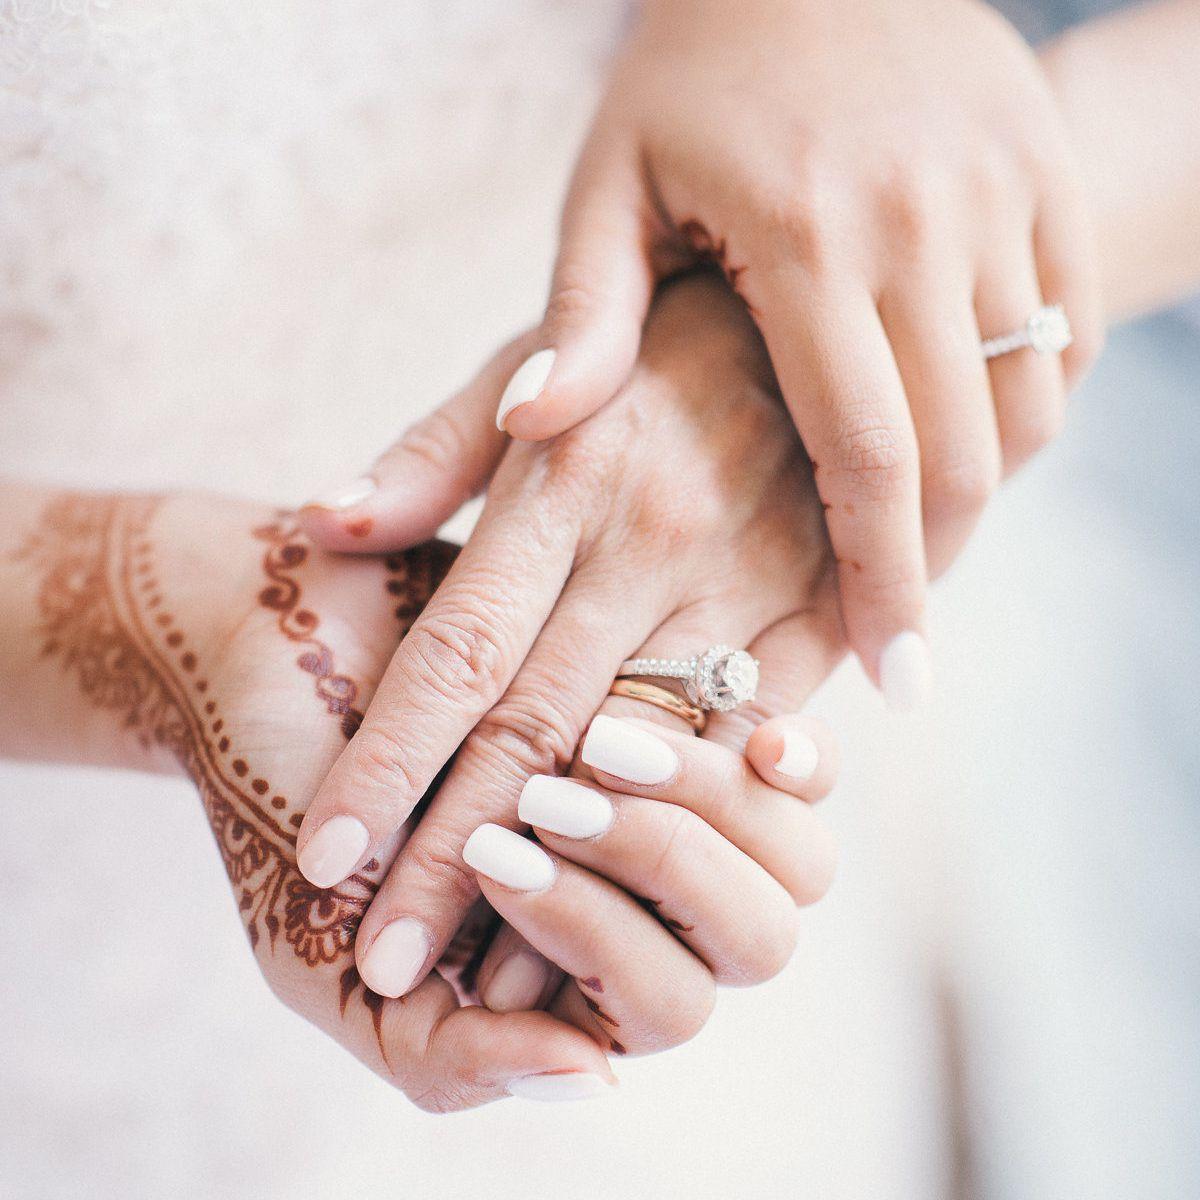 Bride with white nail polish